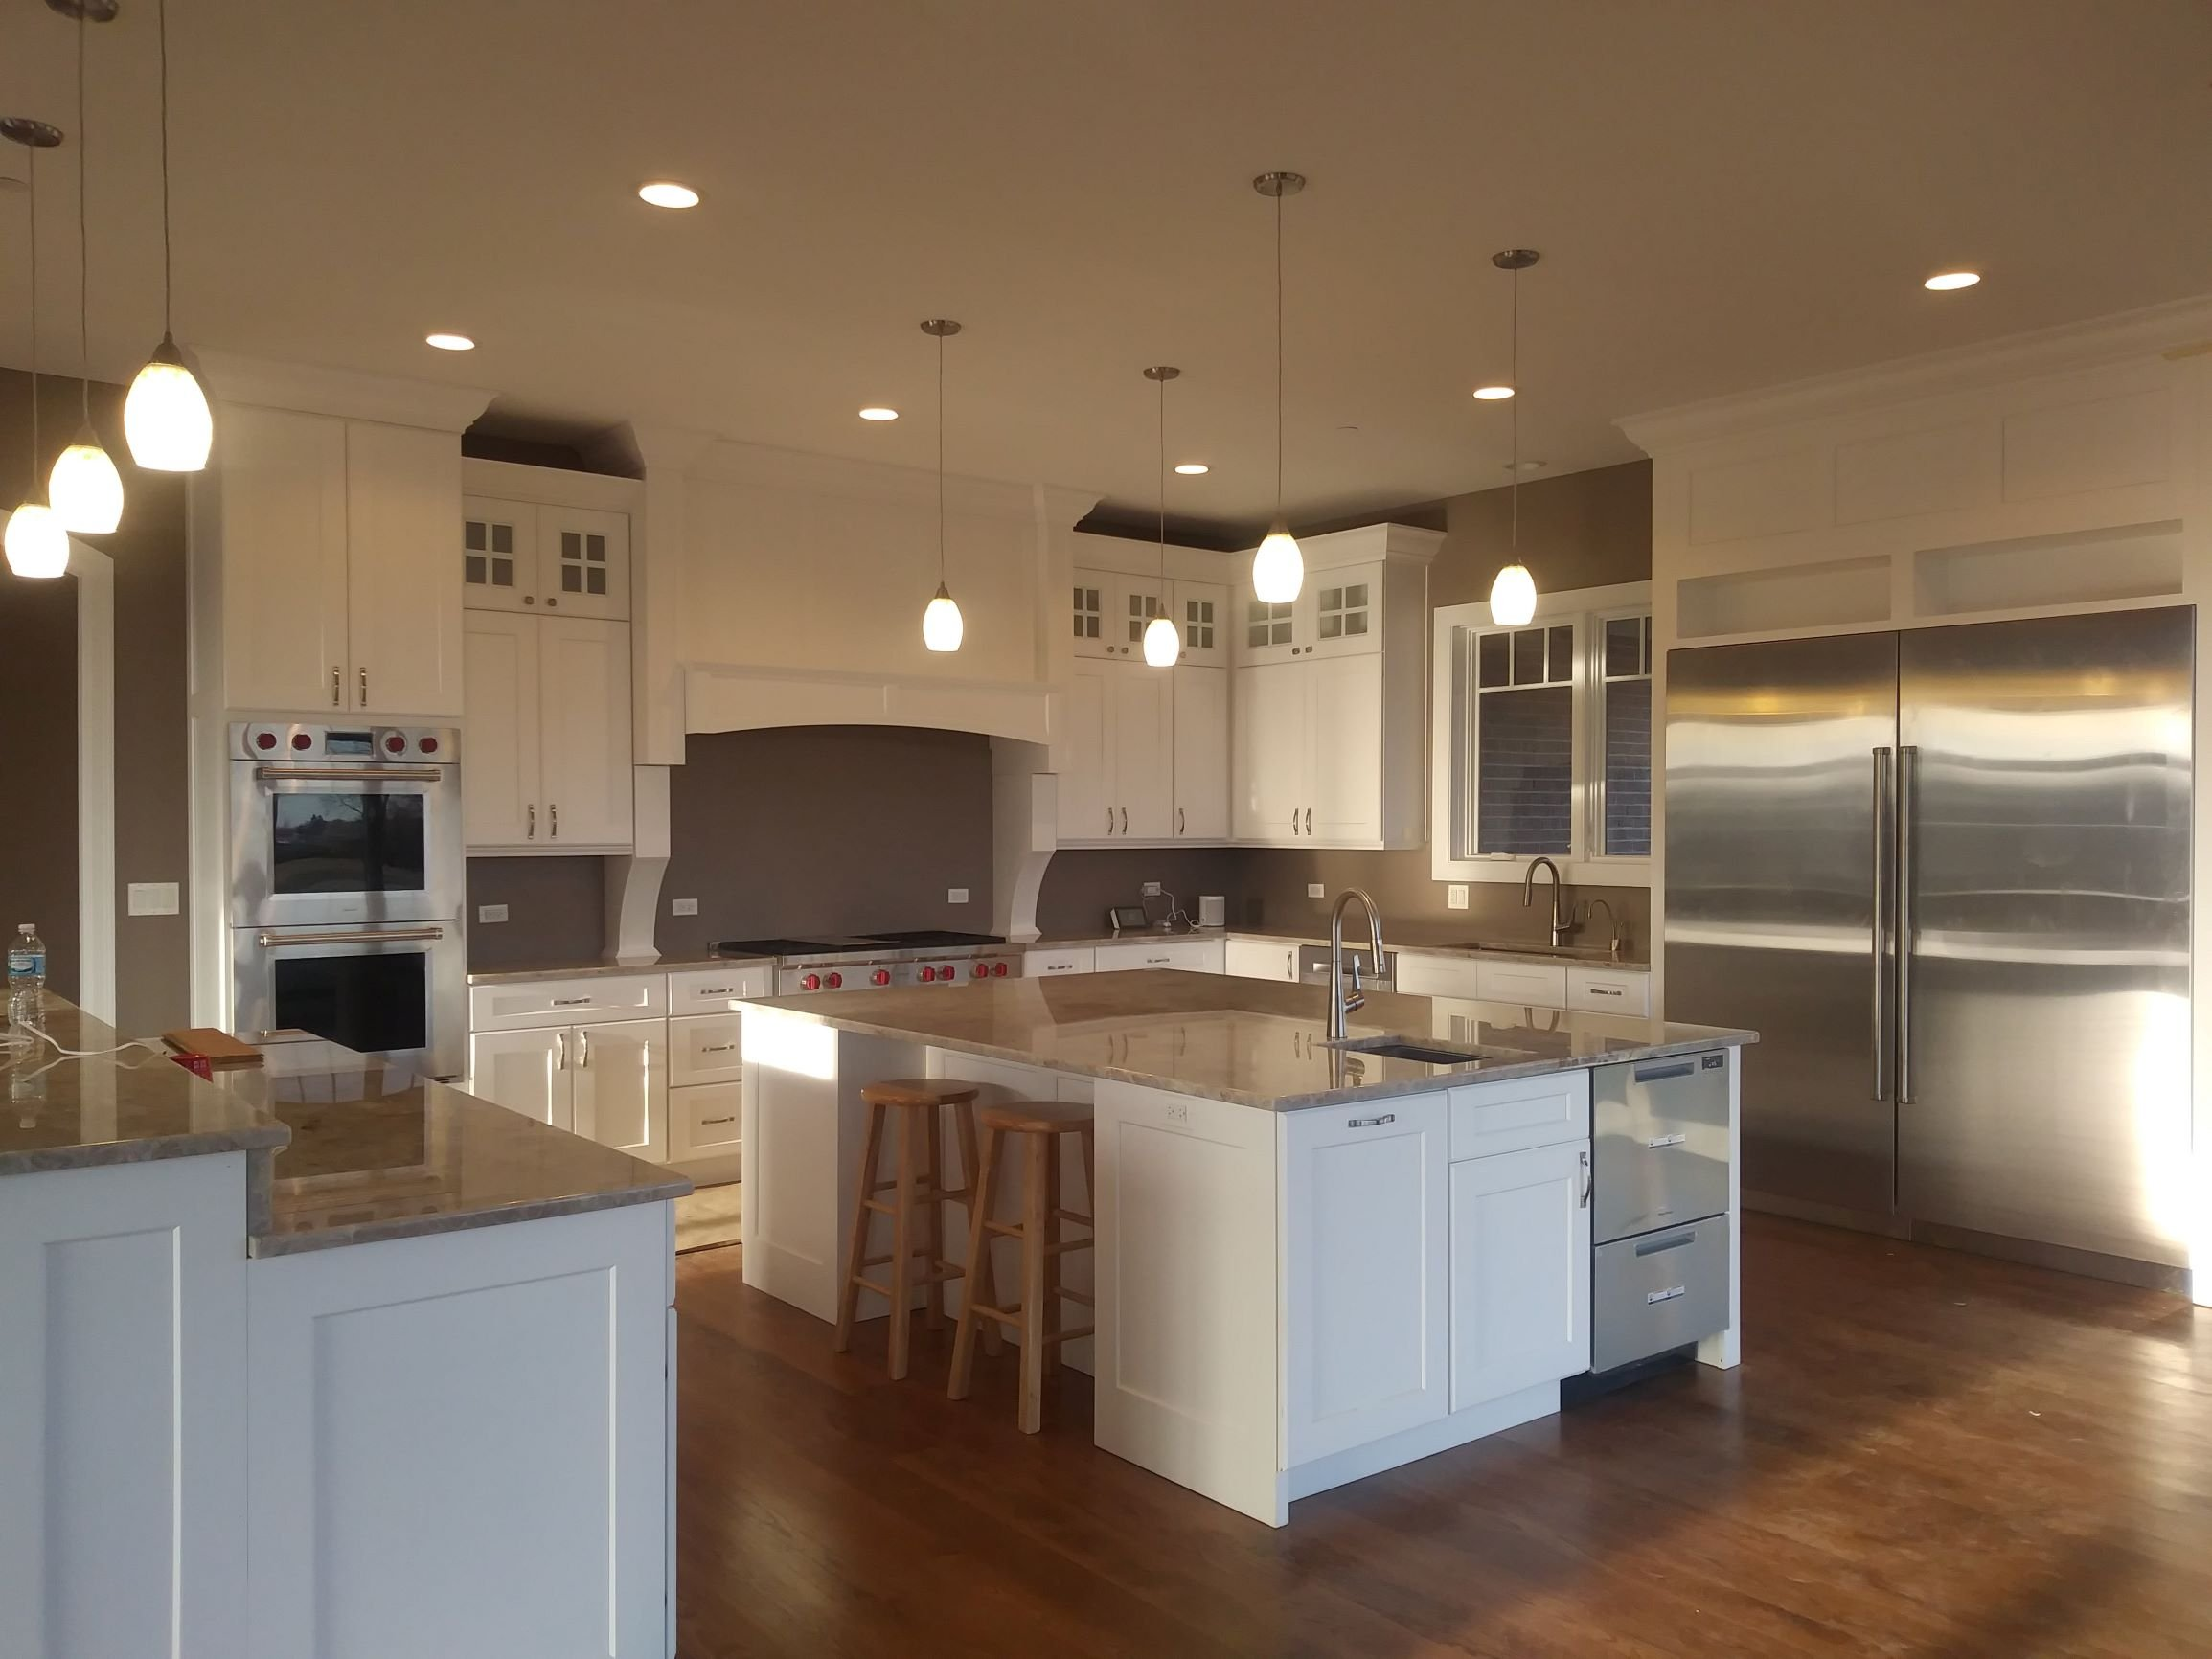 David Harney Kitchen Cabinets Enclave Ln Lake Barrington IL